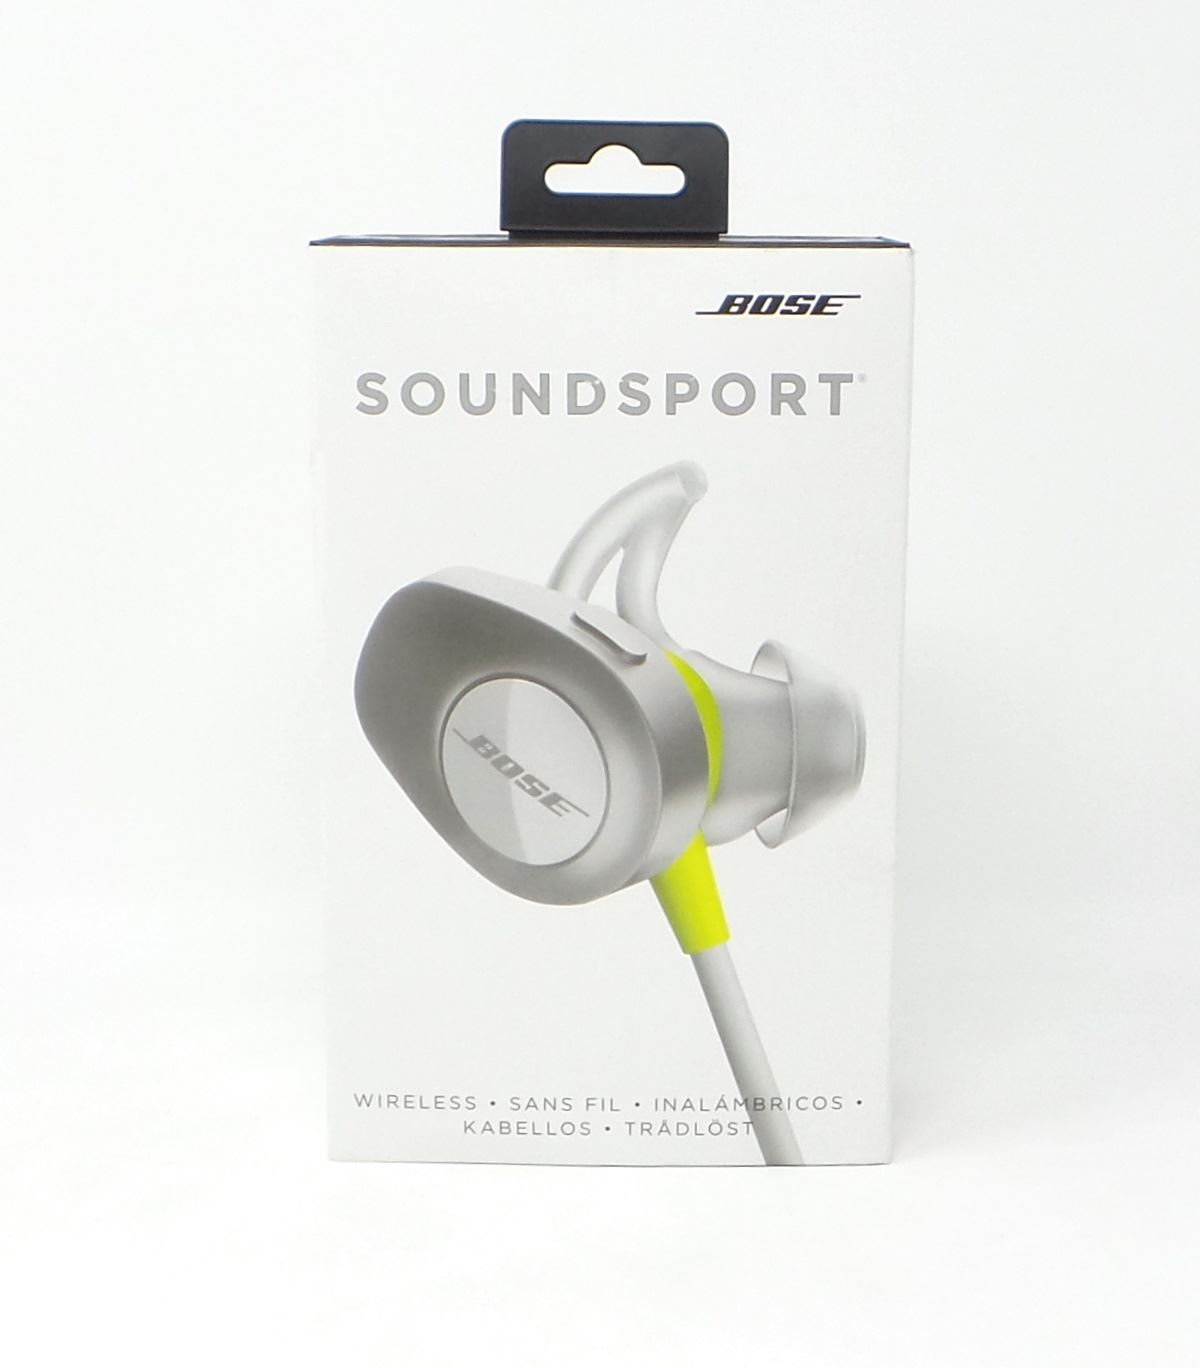 bose soundsport bluetooth wireless in ear headphones 761529 0030 citron ebay. Black Bedroom Furniture Sets. Home Design Ideas